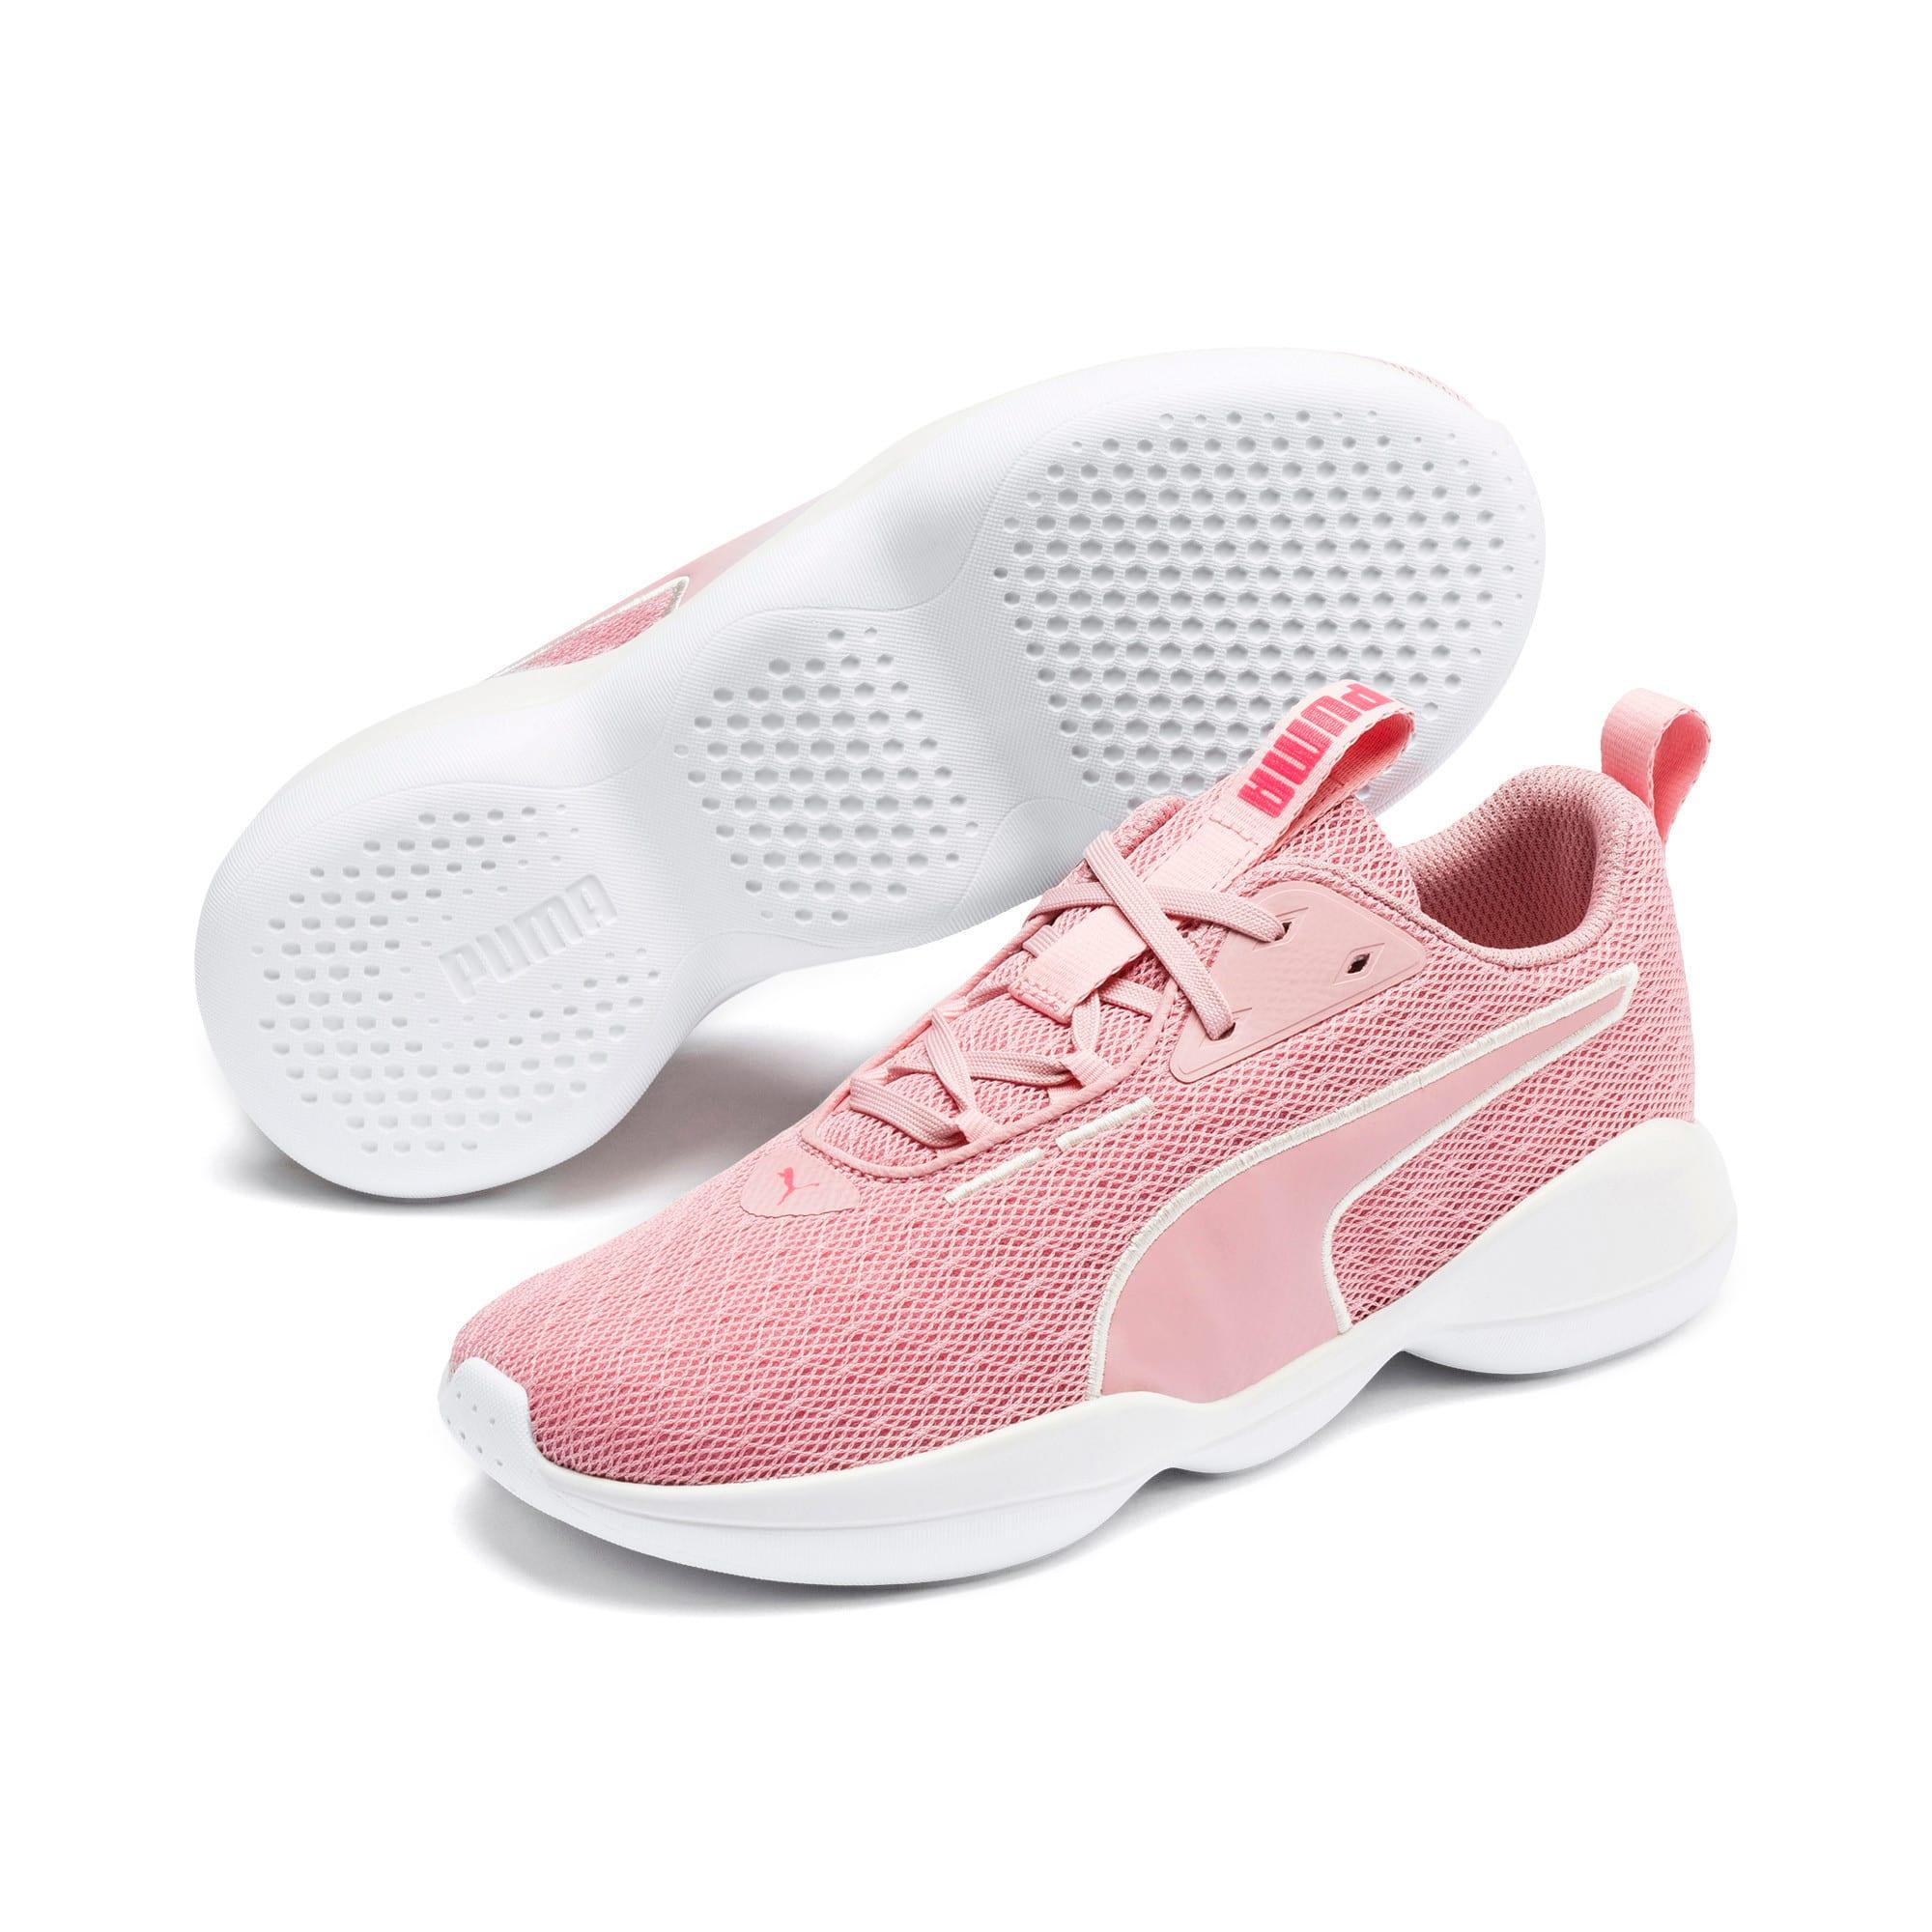 Thumbnail 8 of Flourish FS Women's Running Shoes, Bridal Rose-Puma White, medium-IND